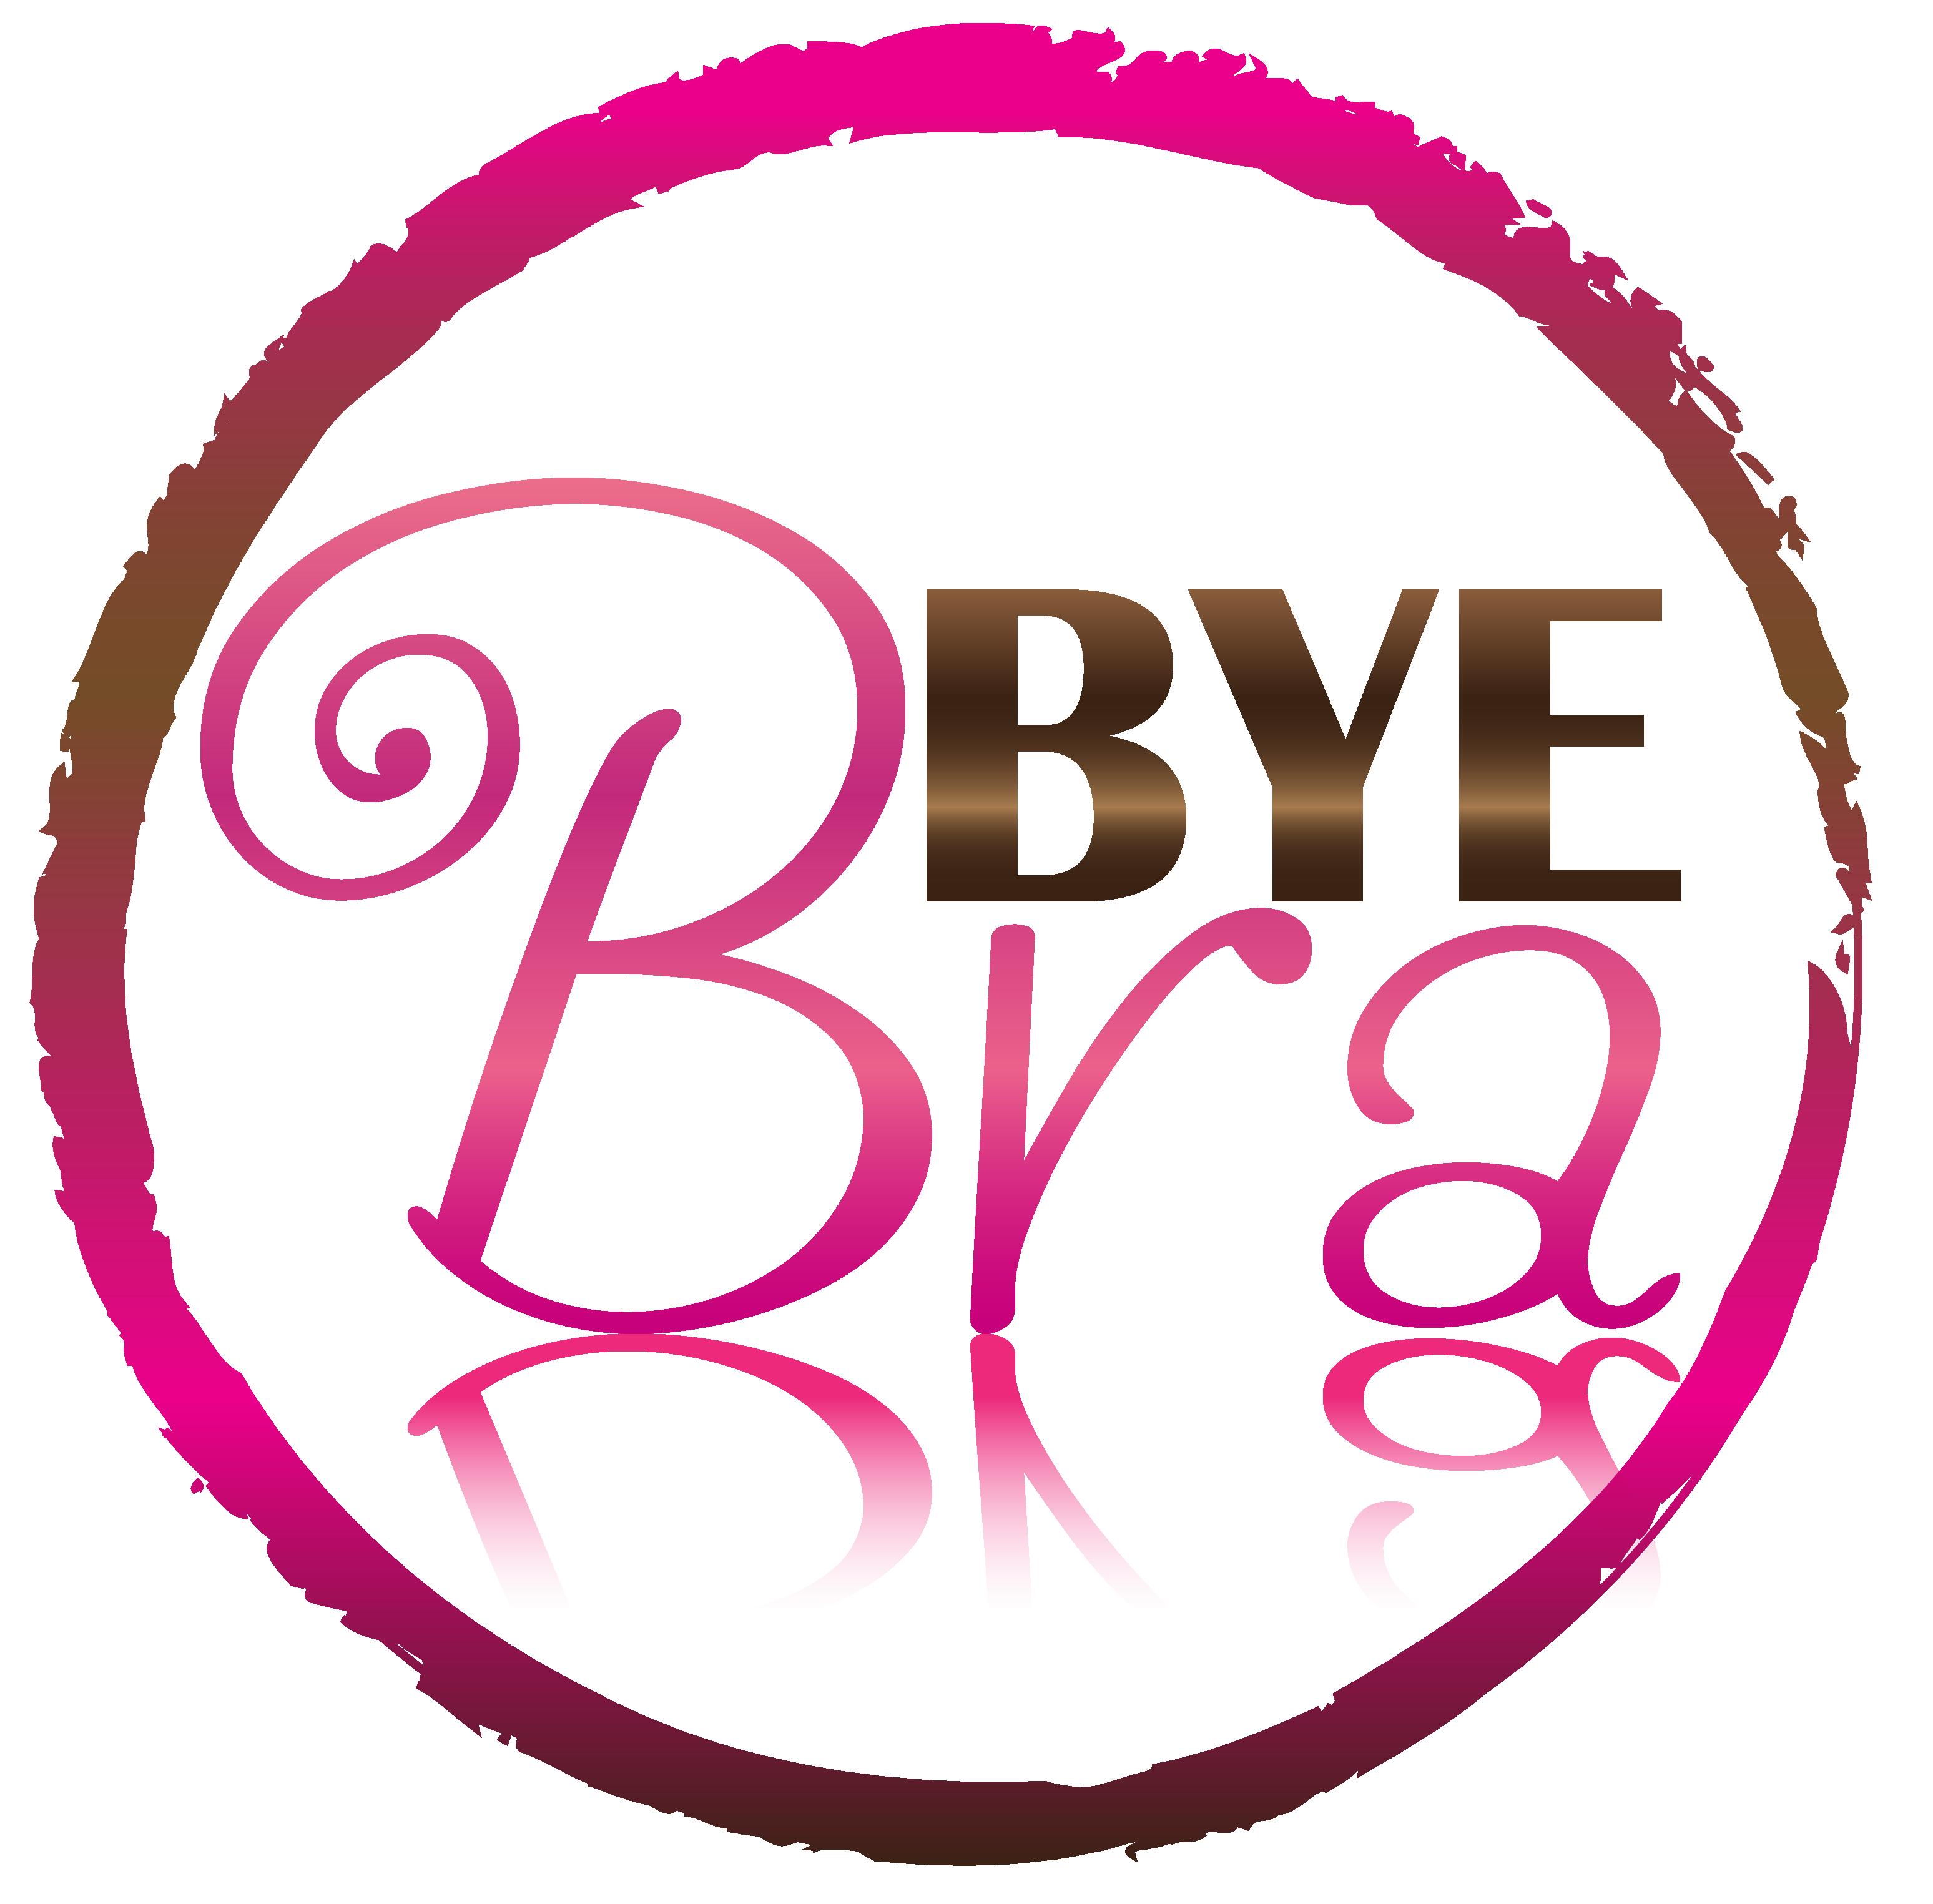 Bye Bra brand